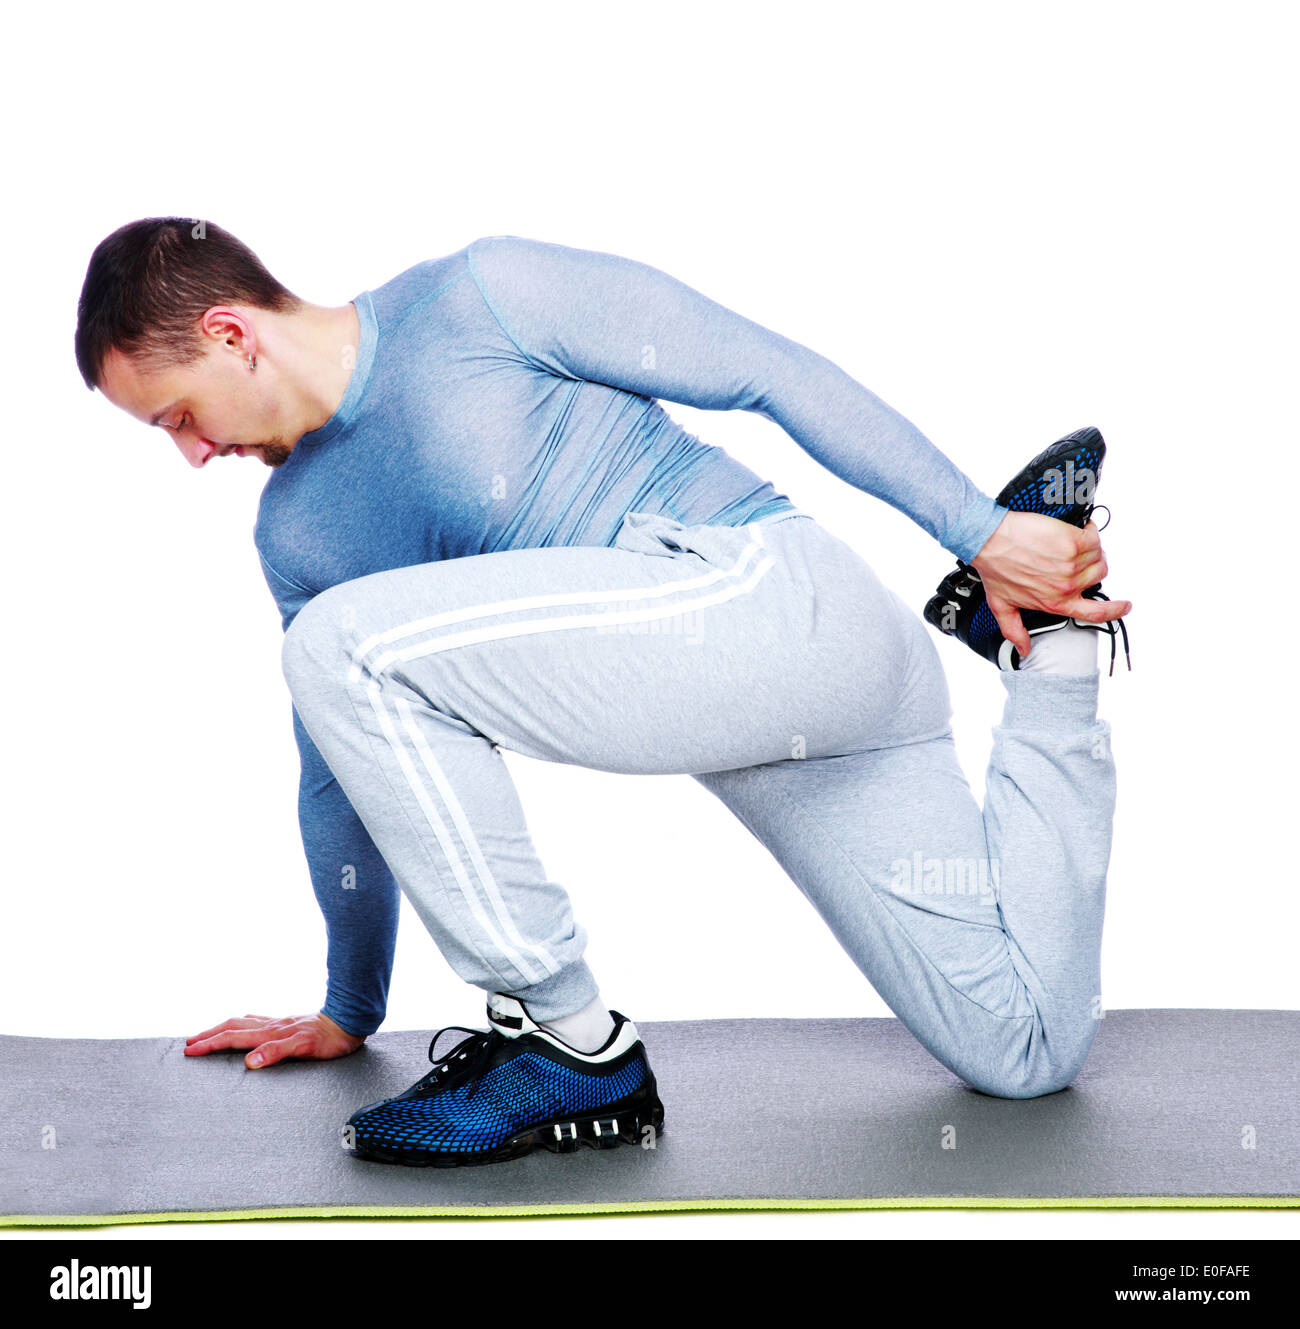 Deportes hombre estirando sobre fondo blanco. Imagen De Stock